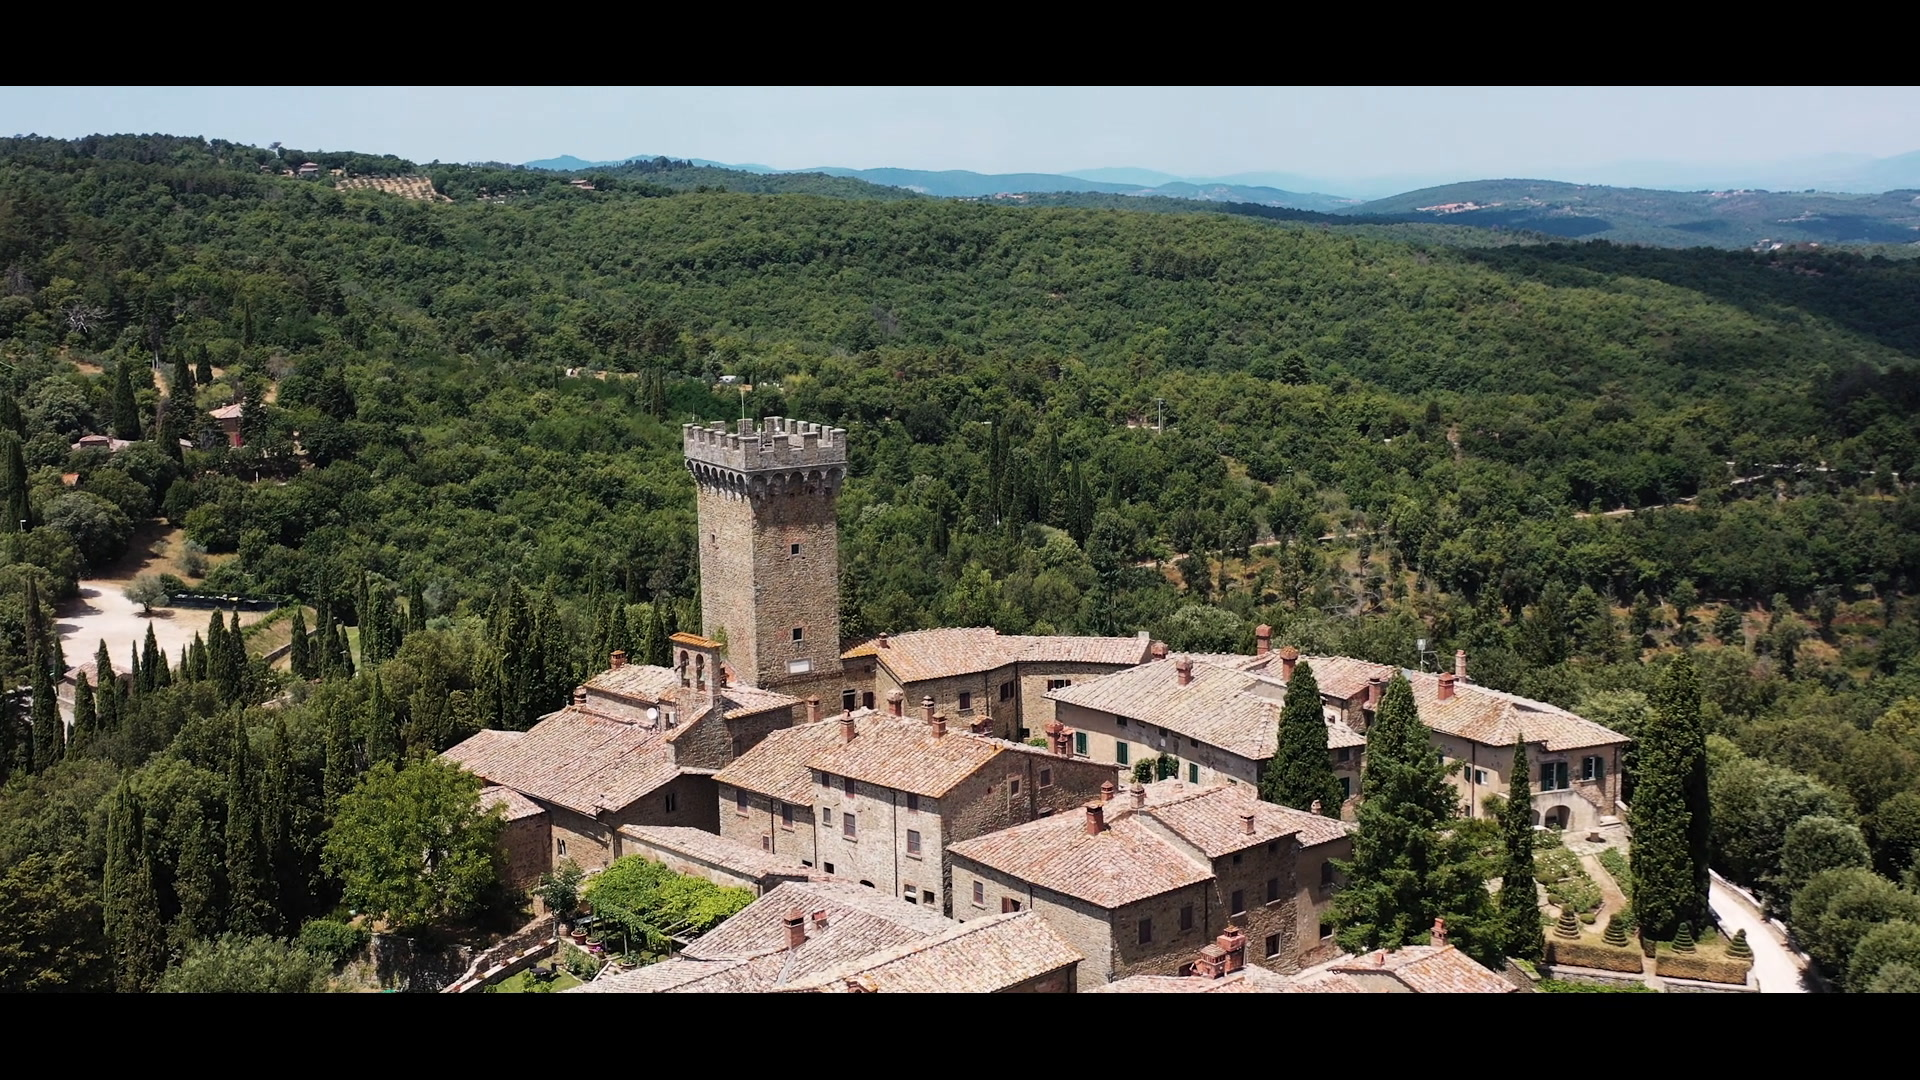 Ben + Sarah | Gargonza, Italy | Castle